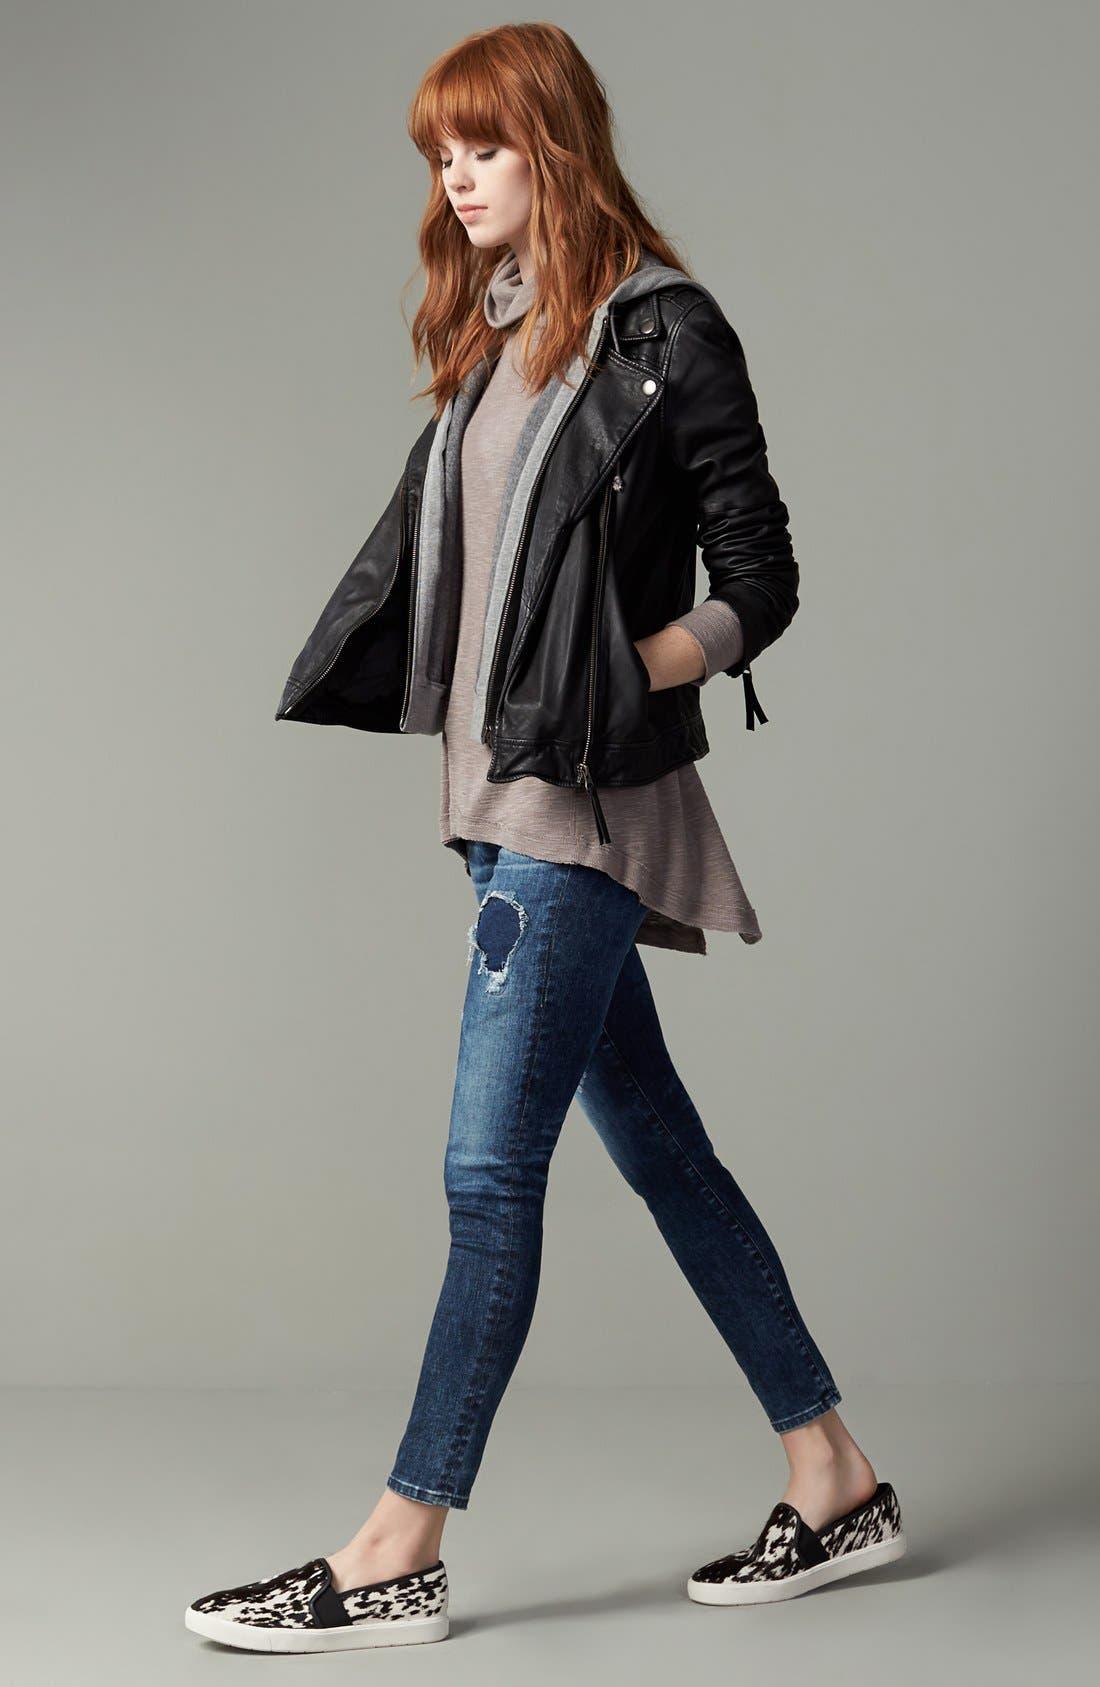 Transcend - Hoxton High Waist Ankle Ultra Skinny Jeans,                             Alternate thumbnail 6, color,                             HARTMANN